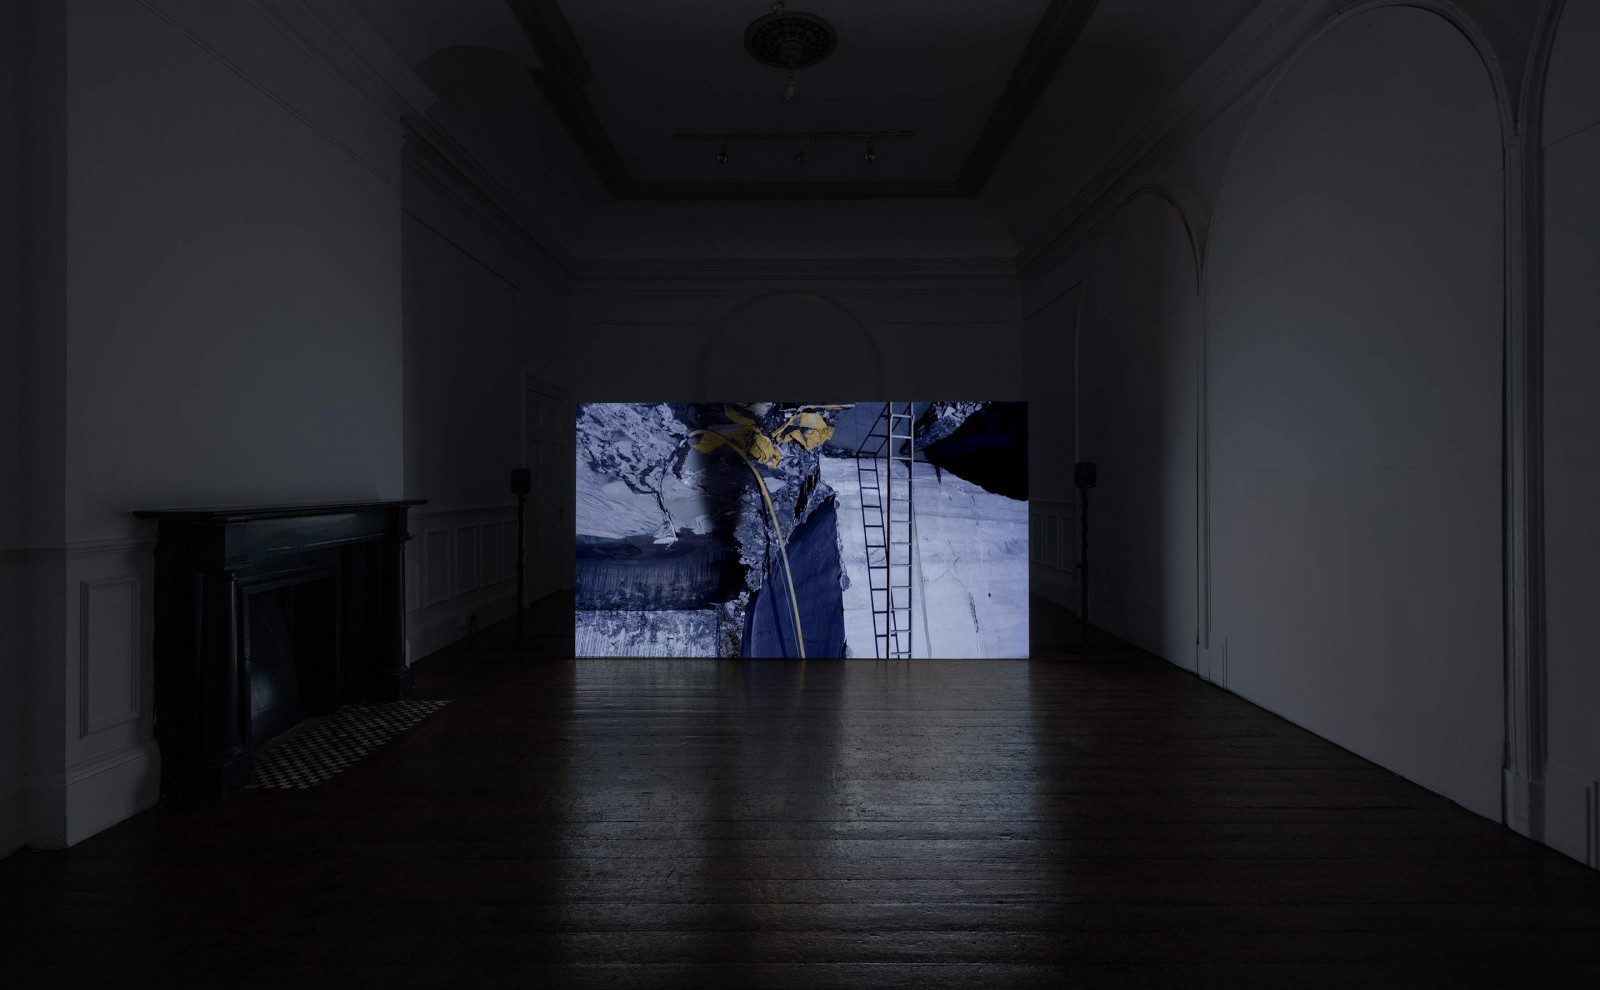 Exhibition view, Sirius Arts Centre, 2018/19. Photo: Jed Niezgoda